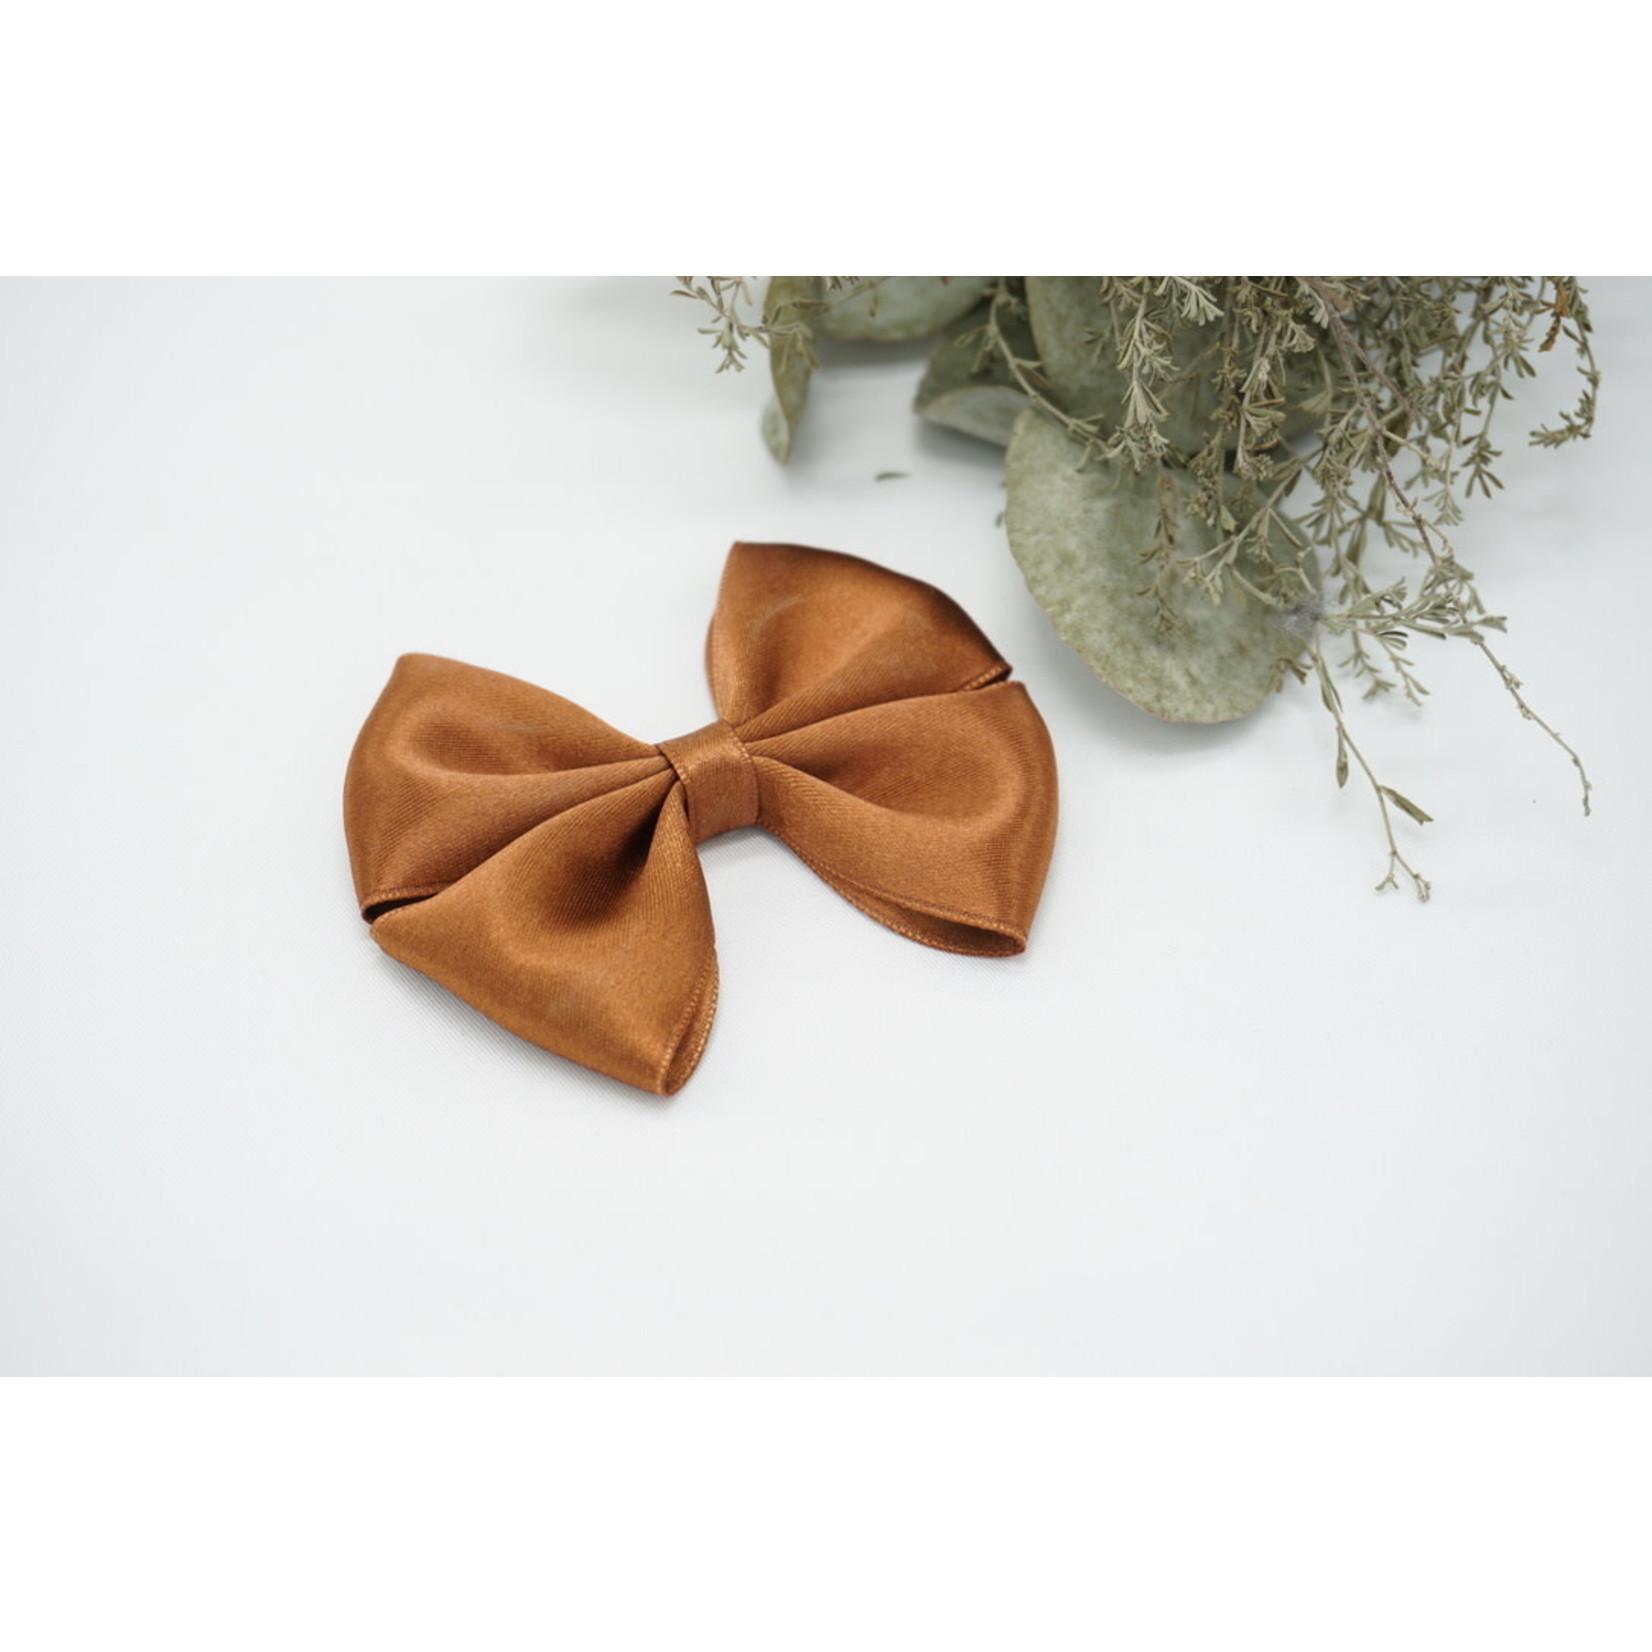 Copy of Satin Bow - Chocolate